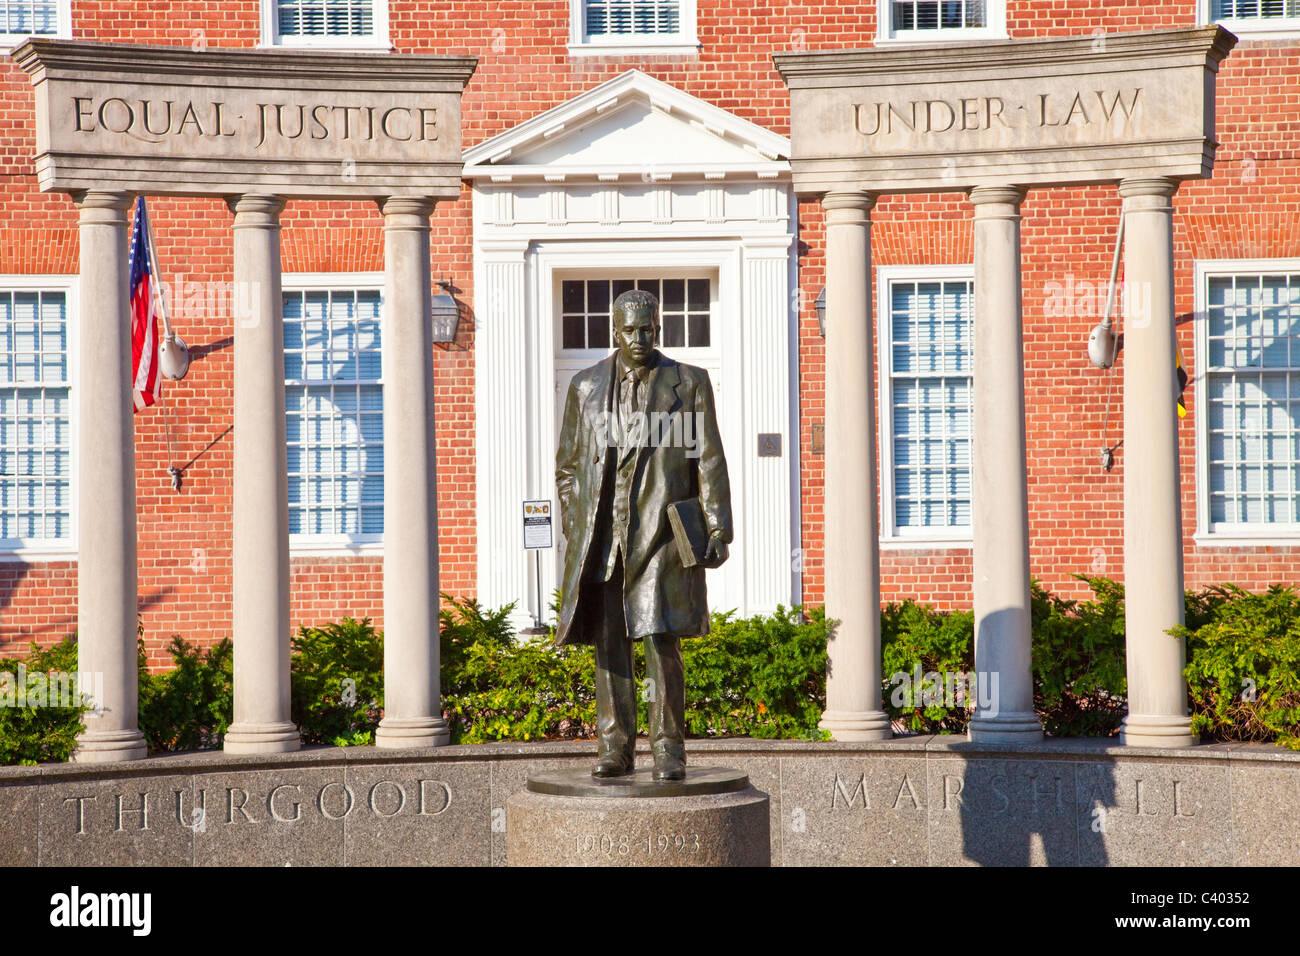 Thurgood Marshall statue, Annapolis, Maryland, USA - Stock Image